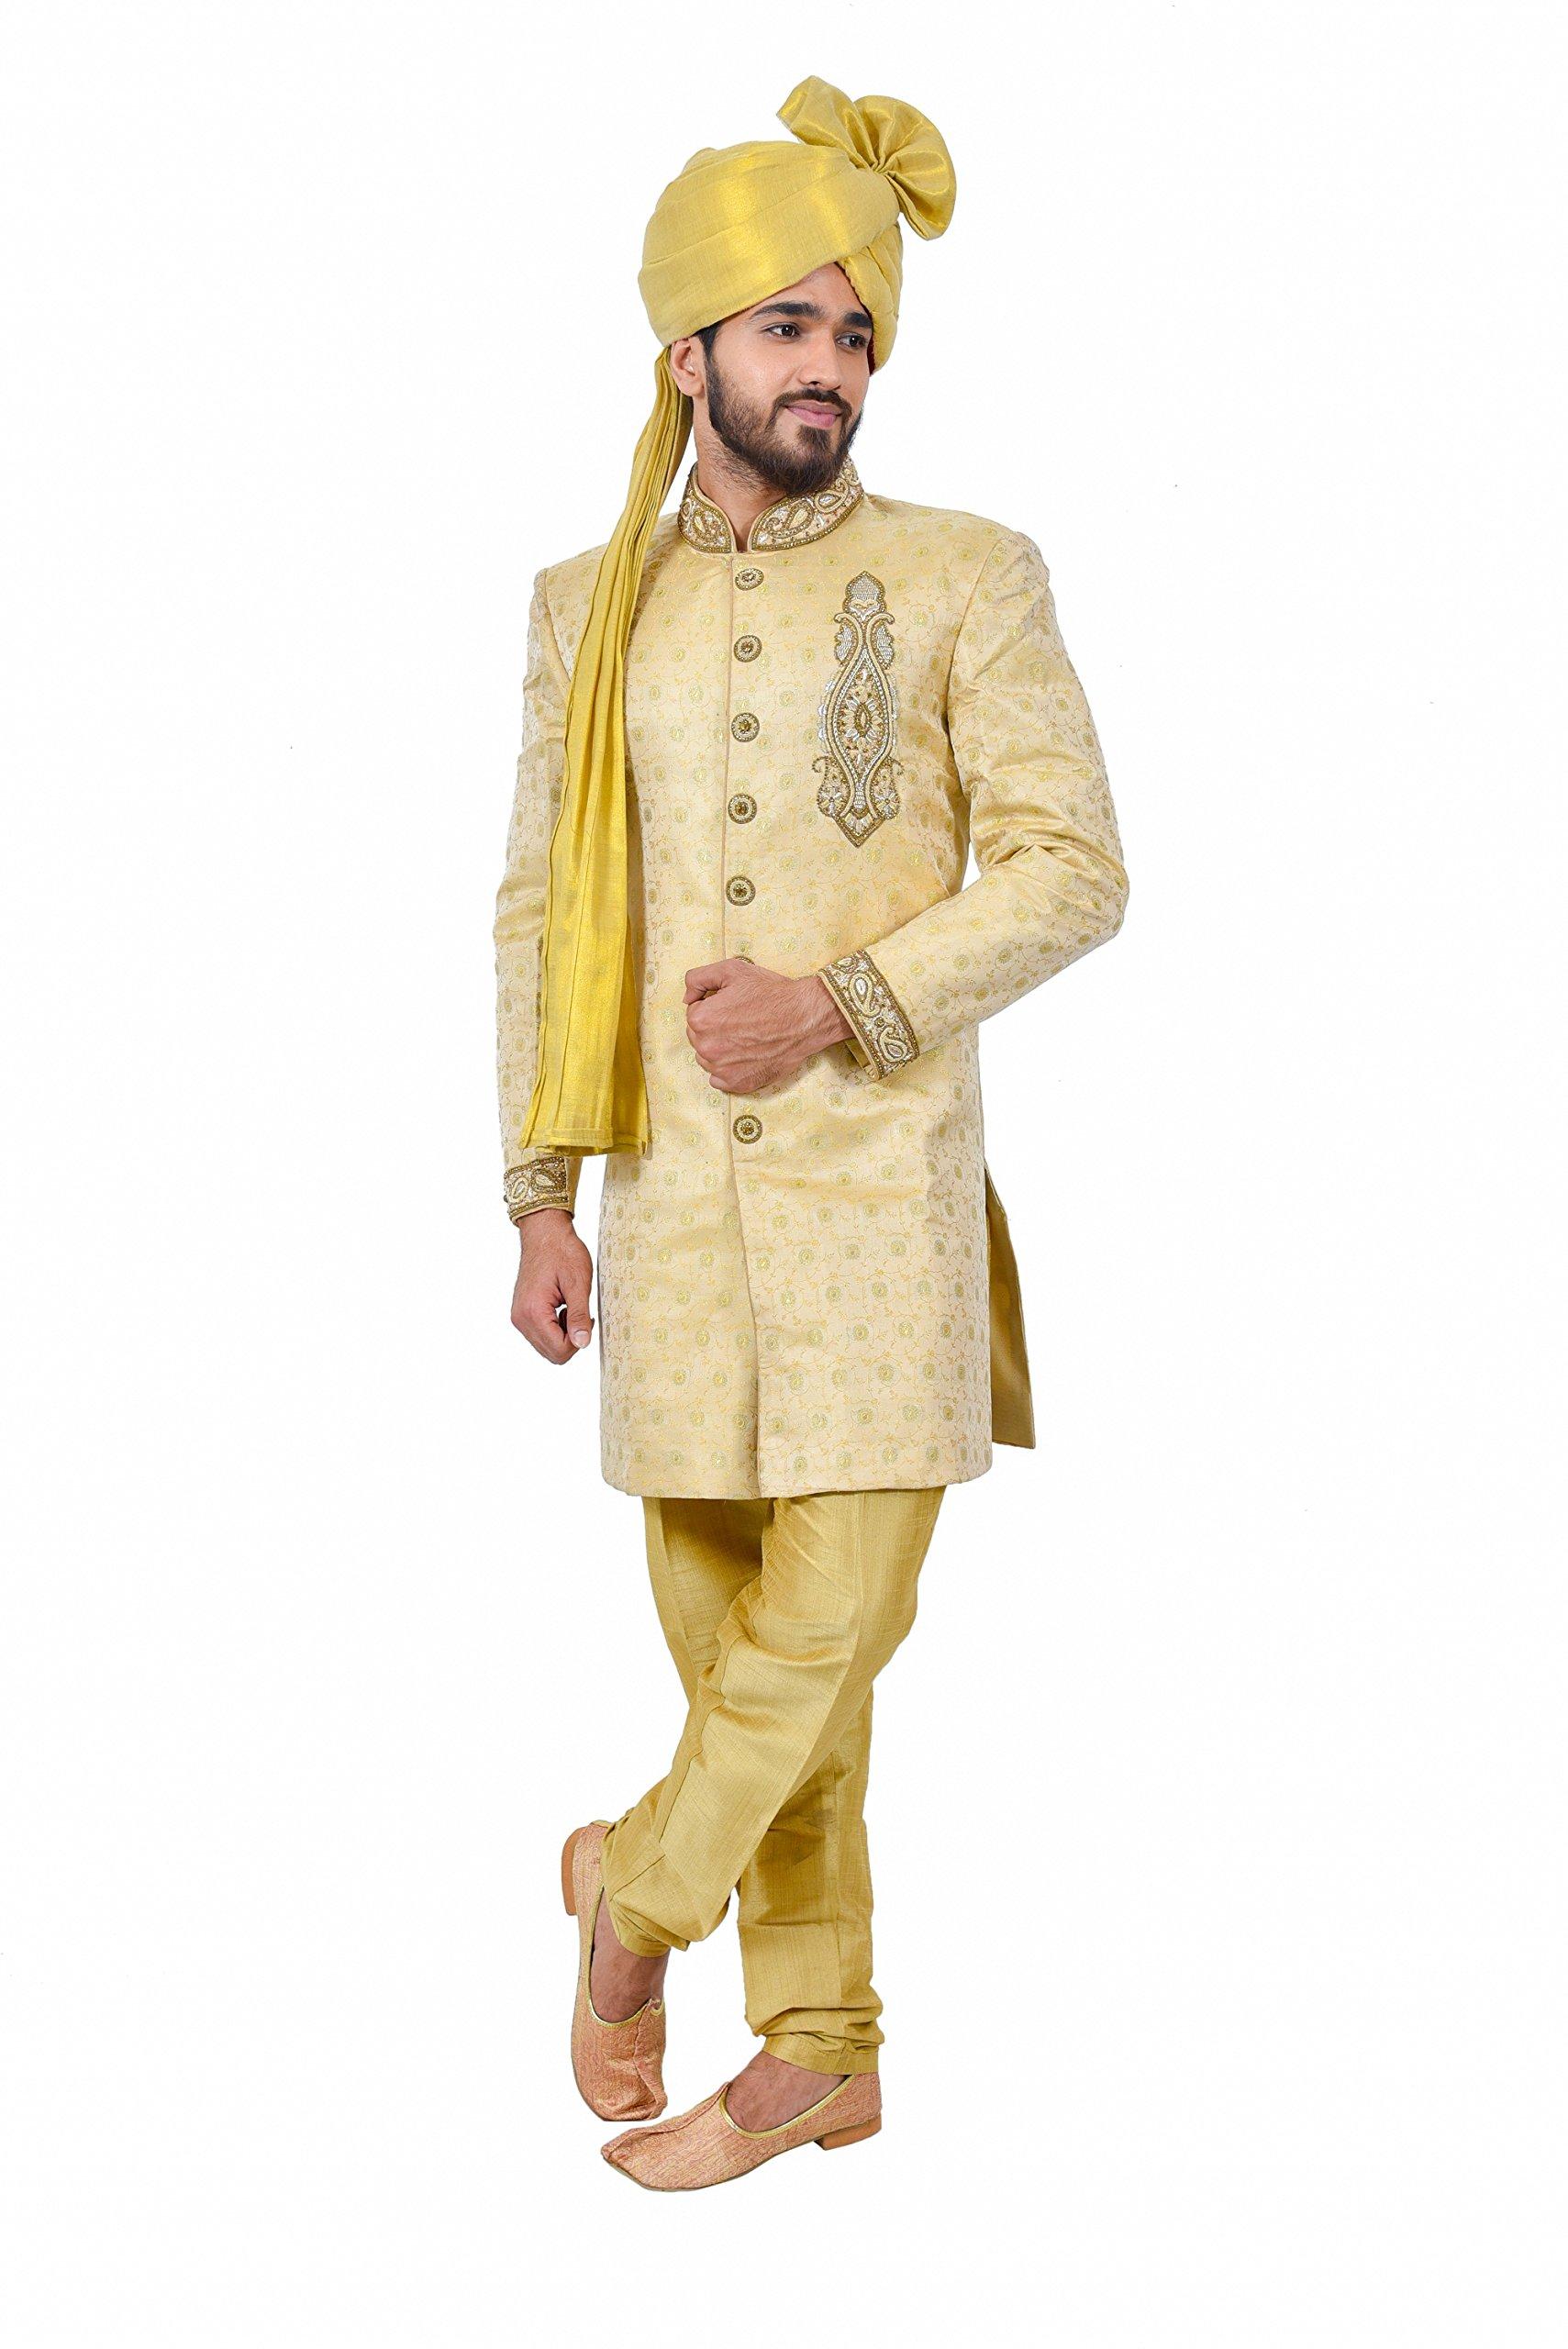 Golden Zari Brocade Silk Traditional Indian Wedding Indo-Western Sherwani for Men by Saris and Things (Image #2)